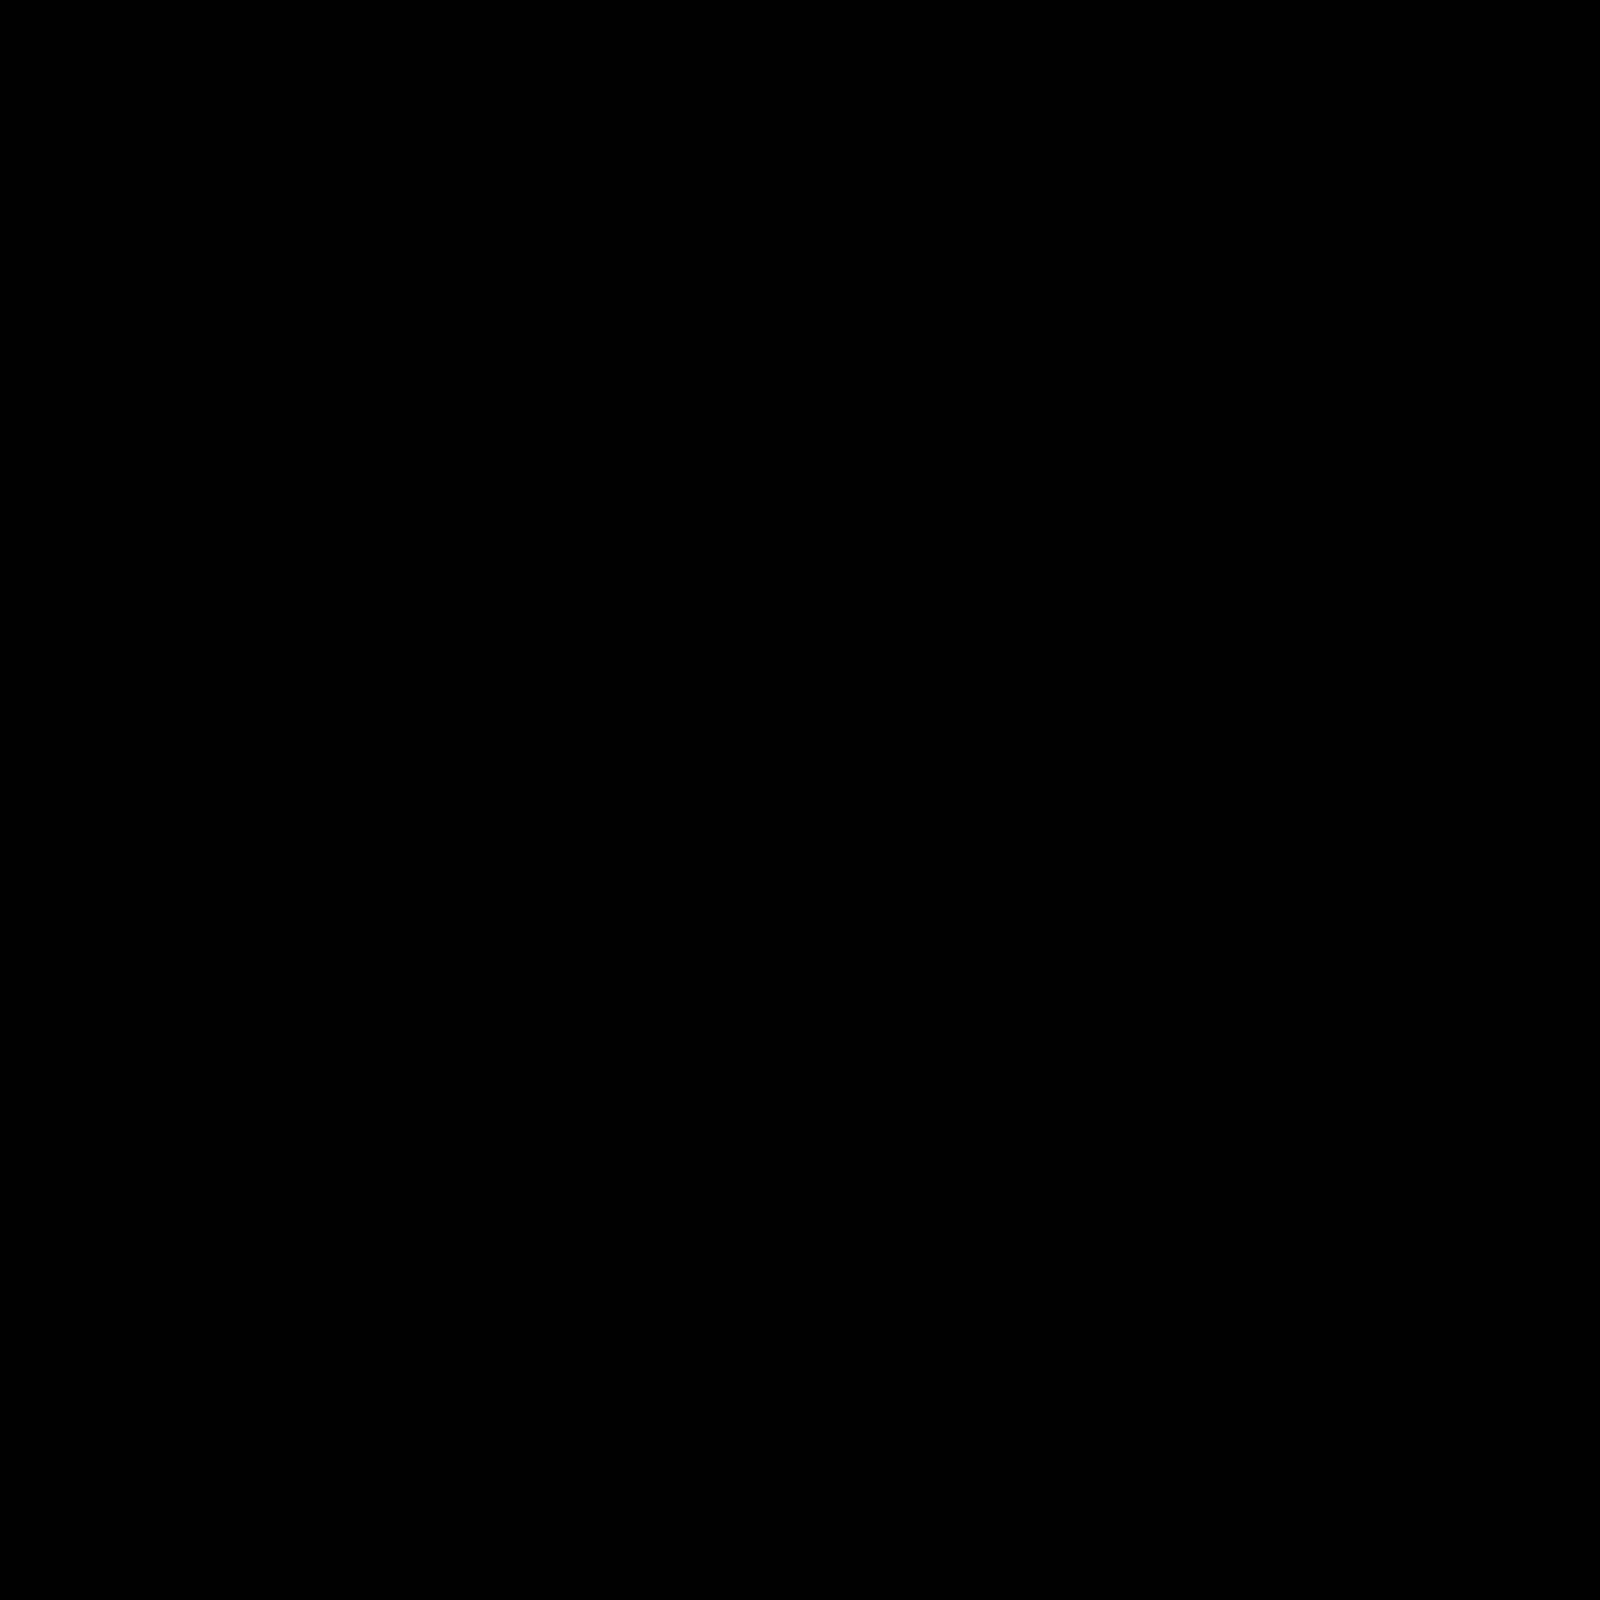 Усы Фу Манчу icon